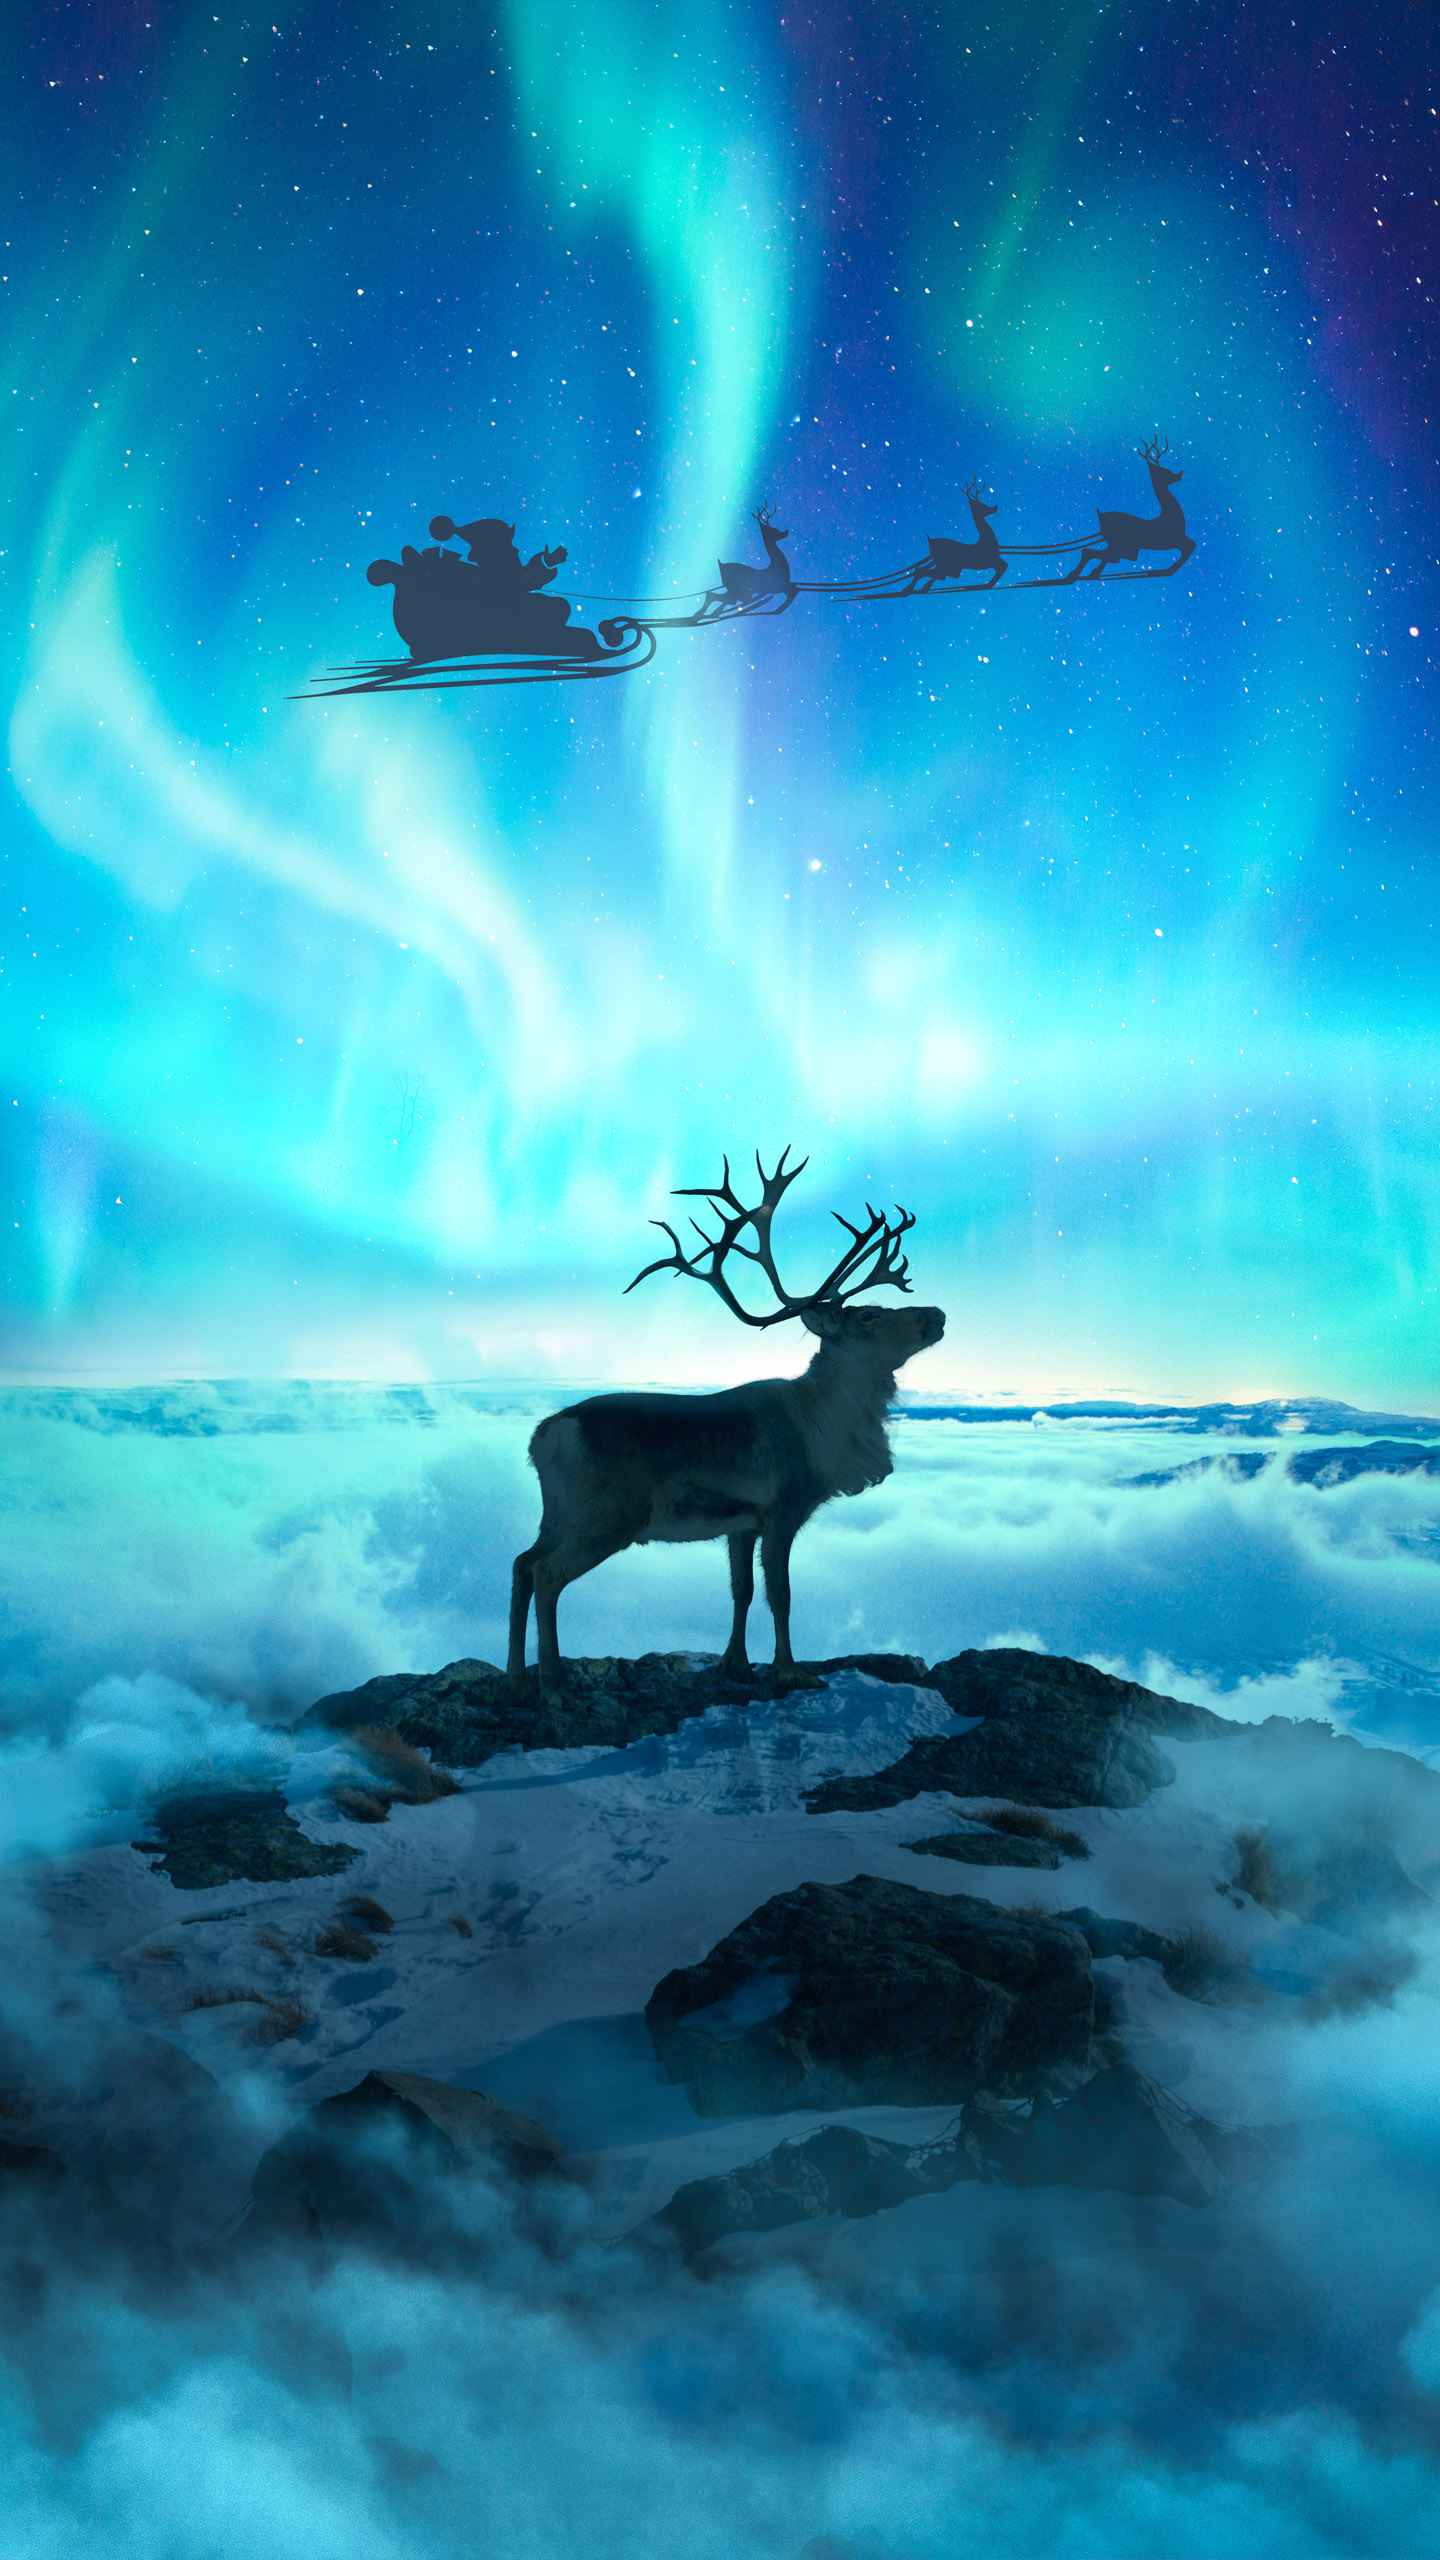 The Christmas Spirit iPhone Wallpaper